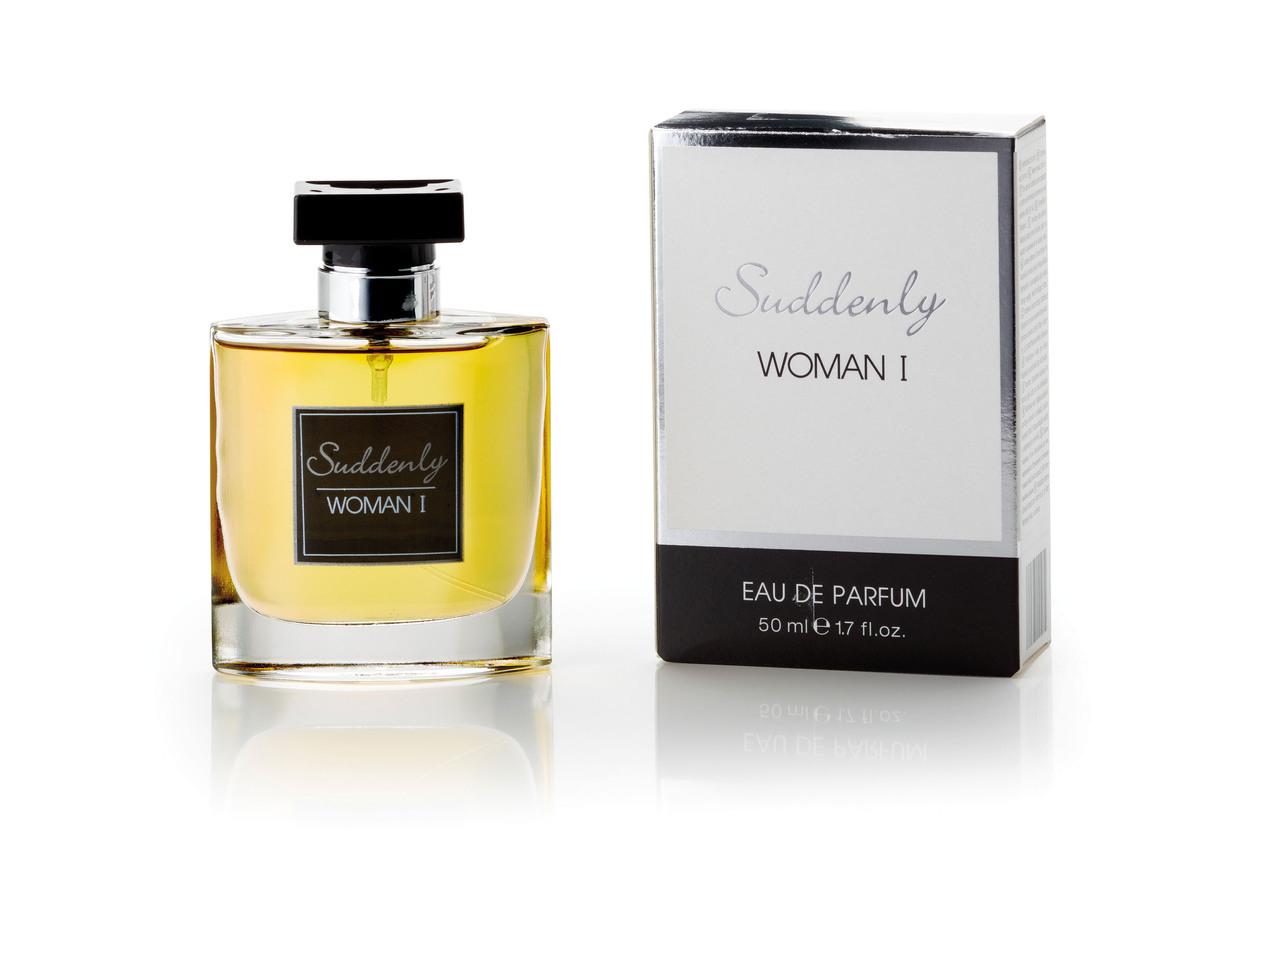 Parfum Suddenly Woman I Wwwattractifcoiffurefr